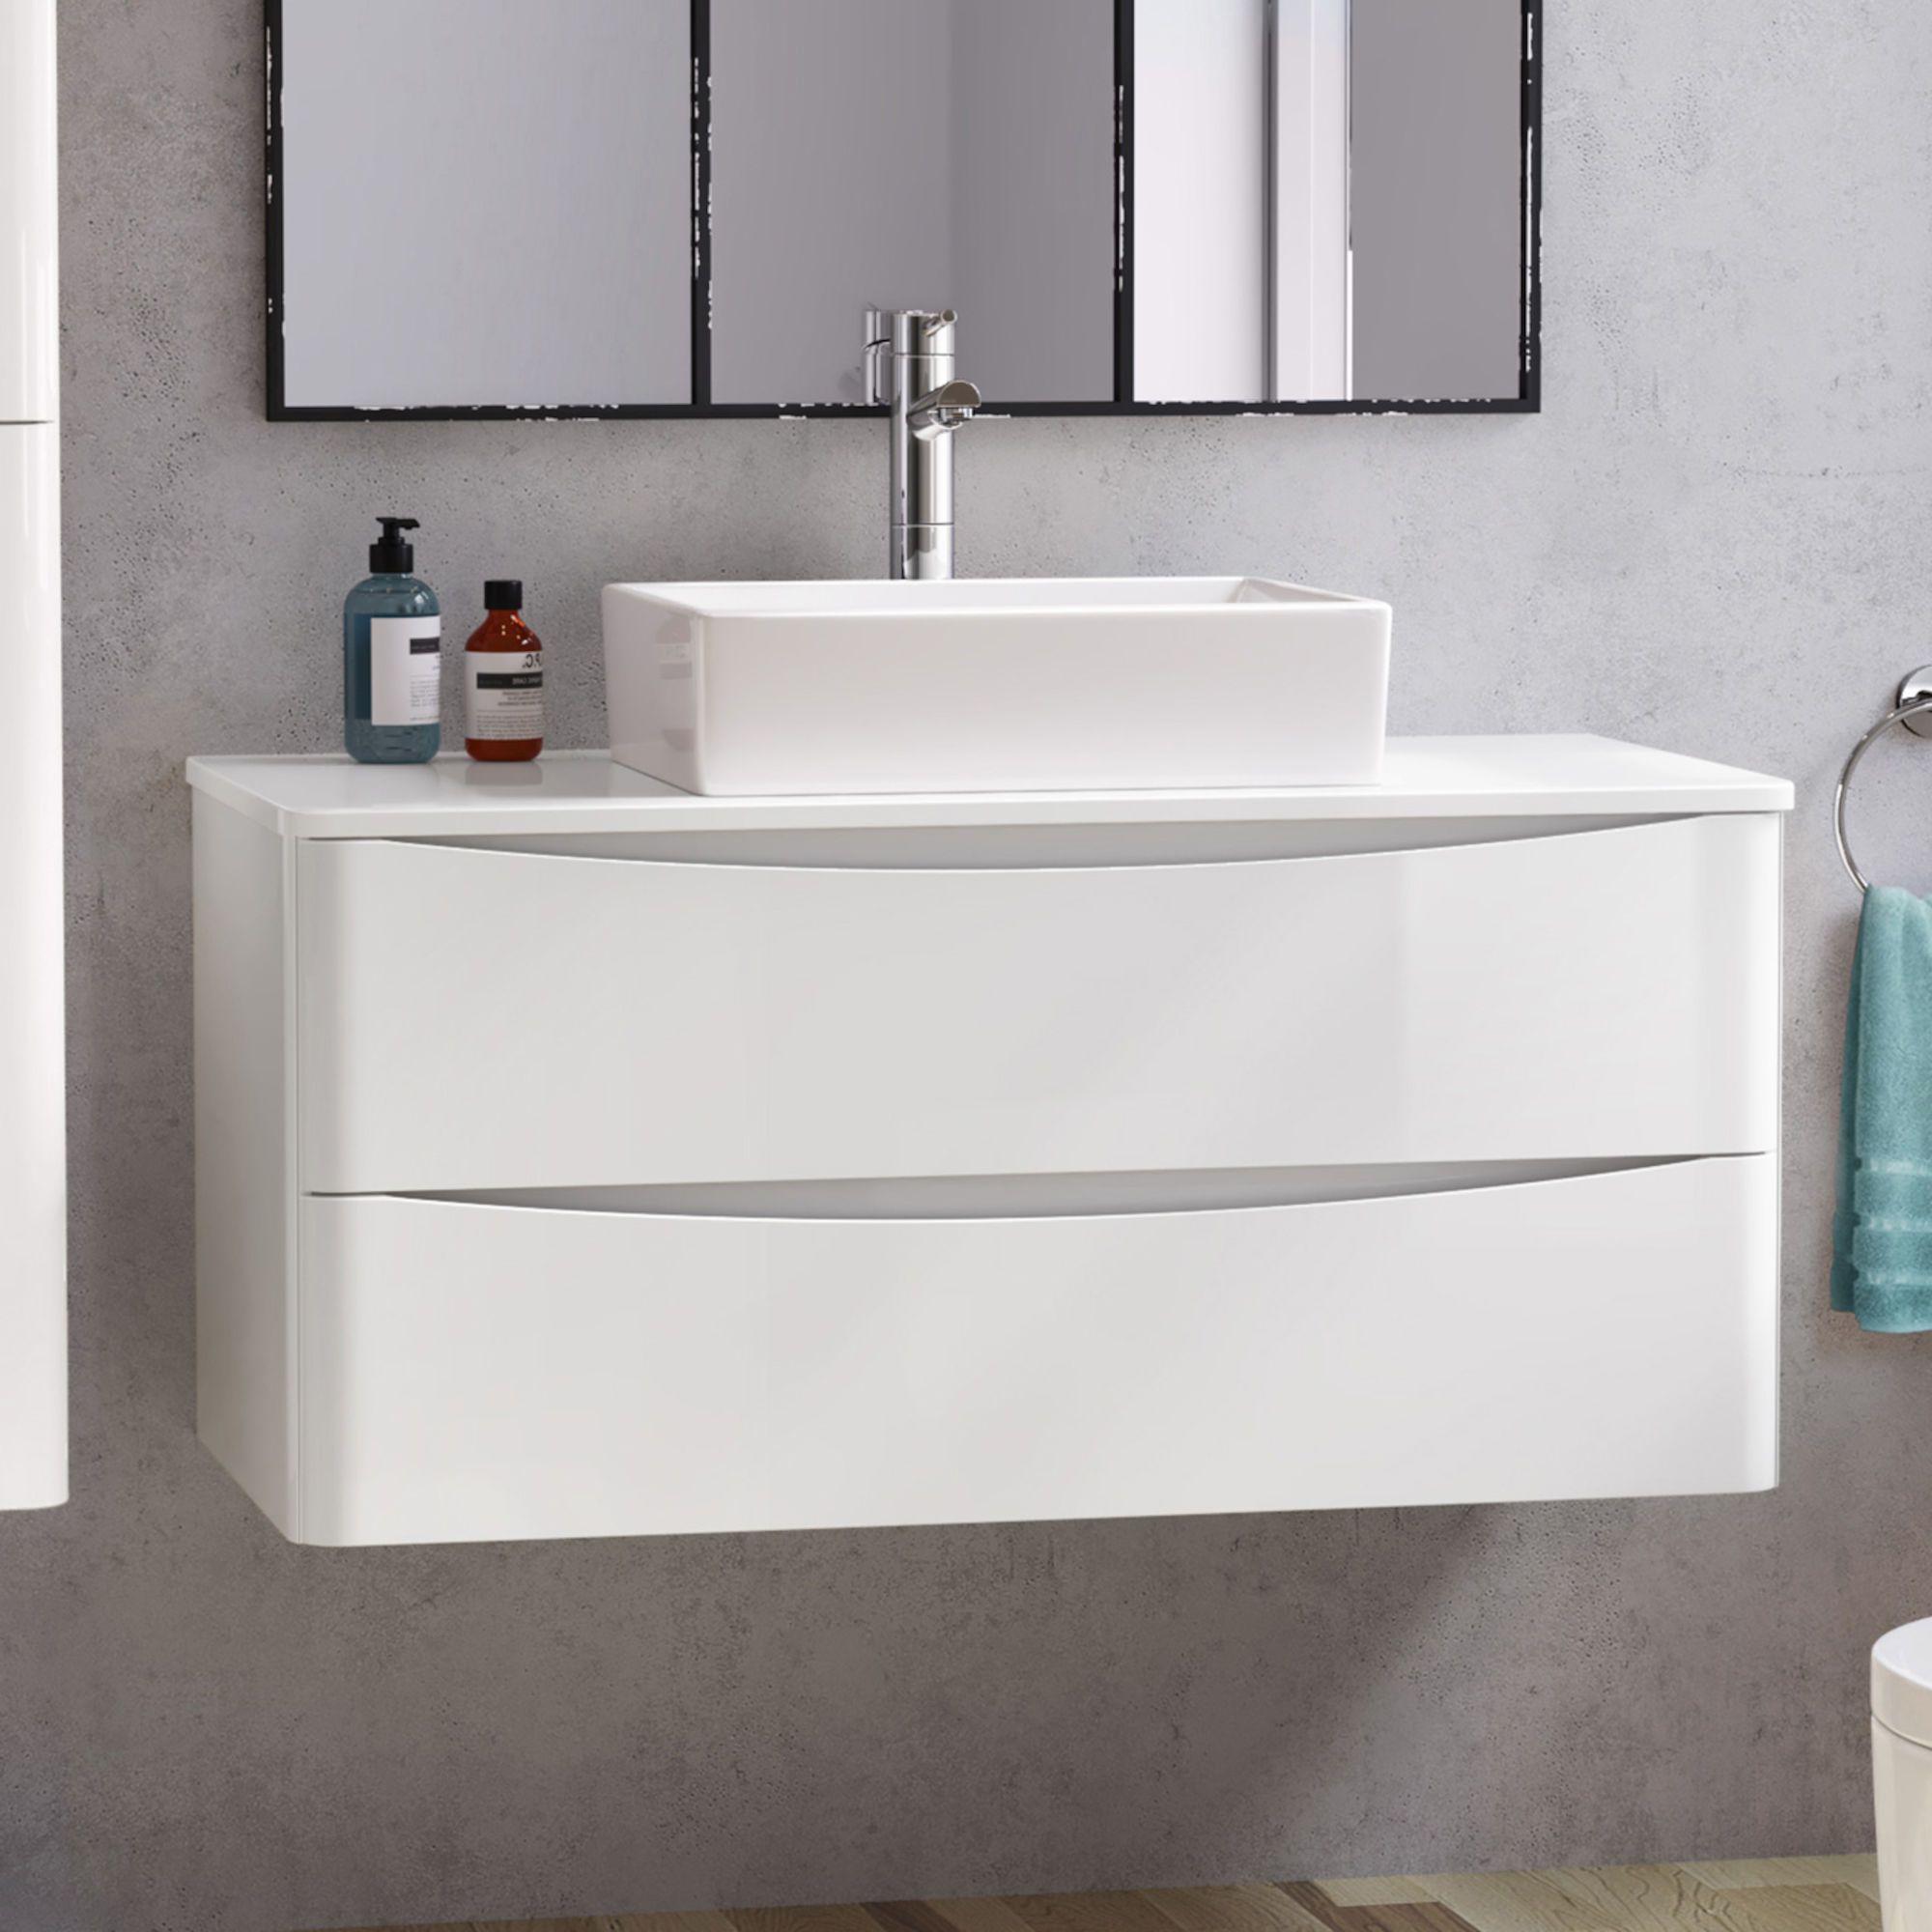 Austin Vanity Unit Alicia Basin 1000mm With Images Bathroom Vanity Units Sink Vanity Unit Wall Hung Vanity